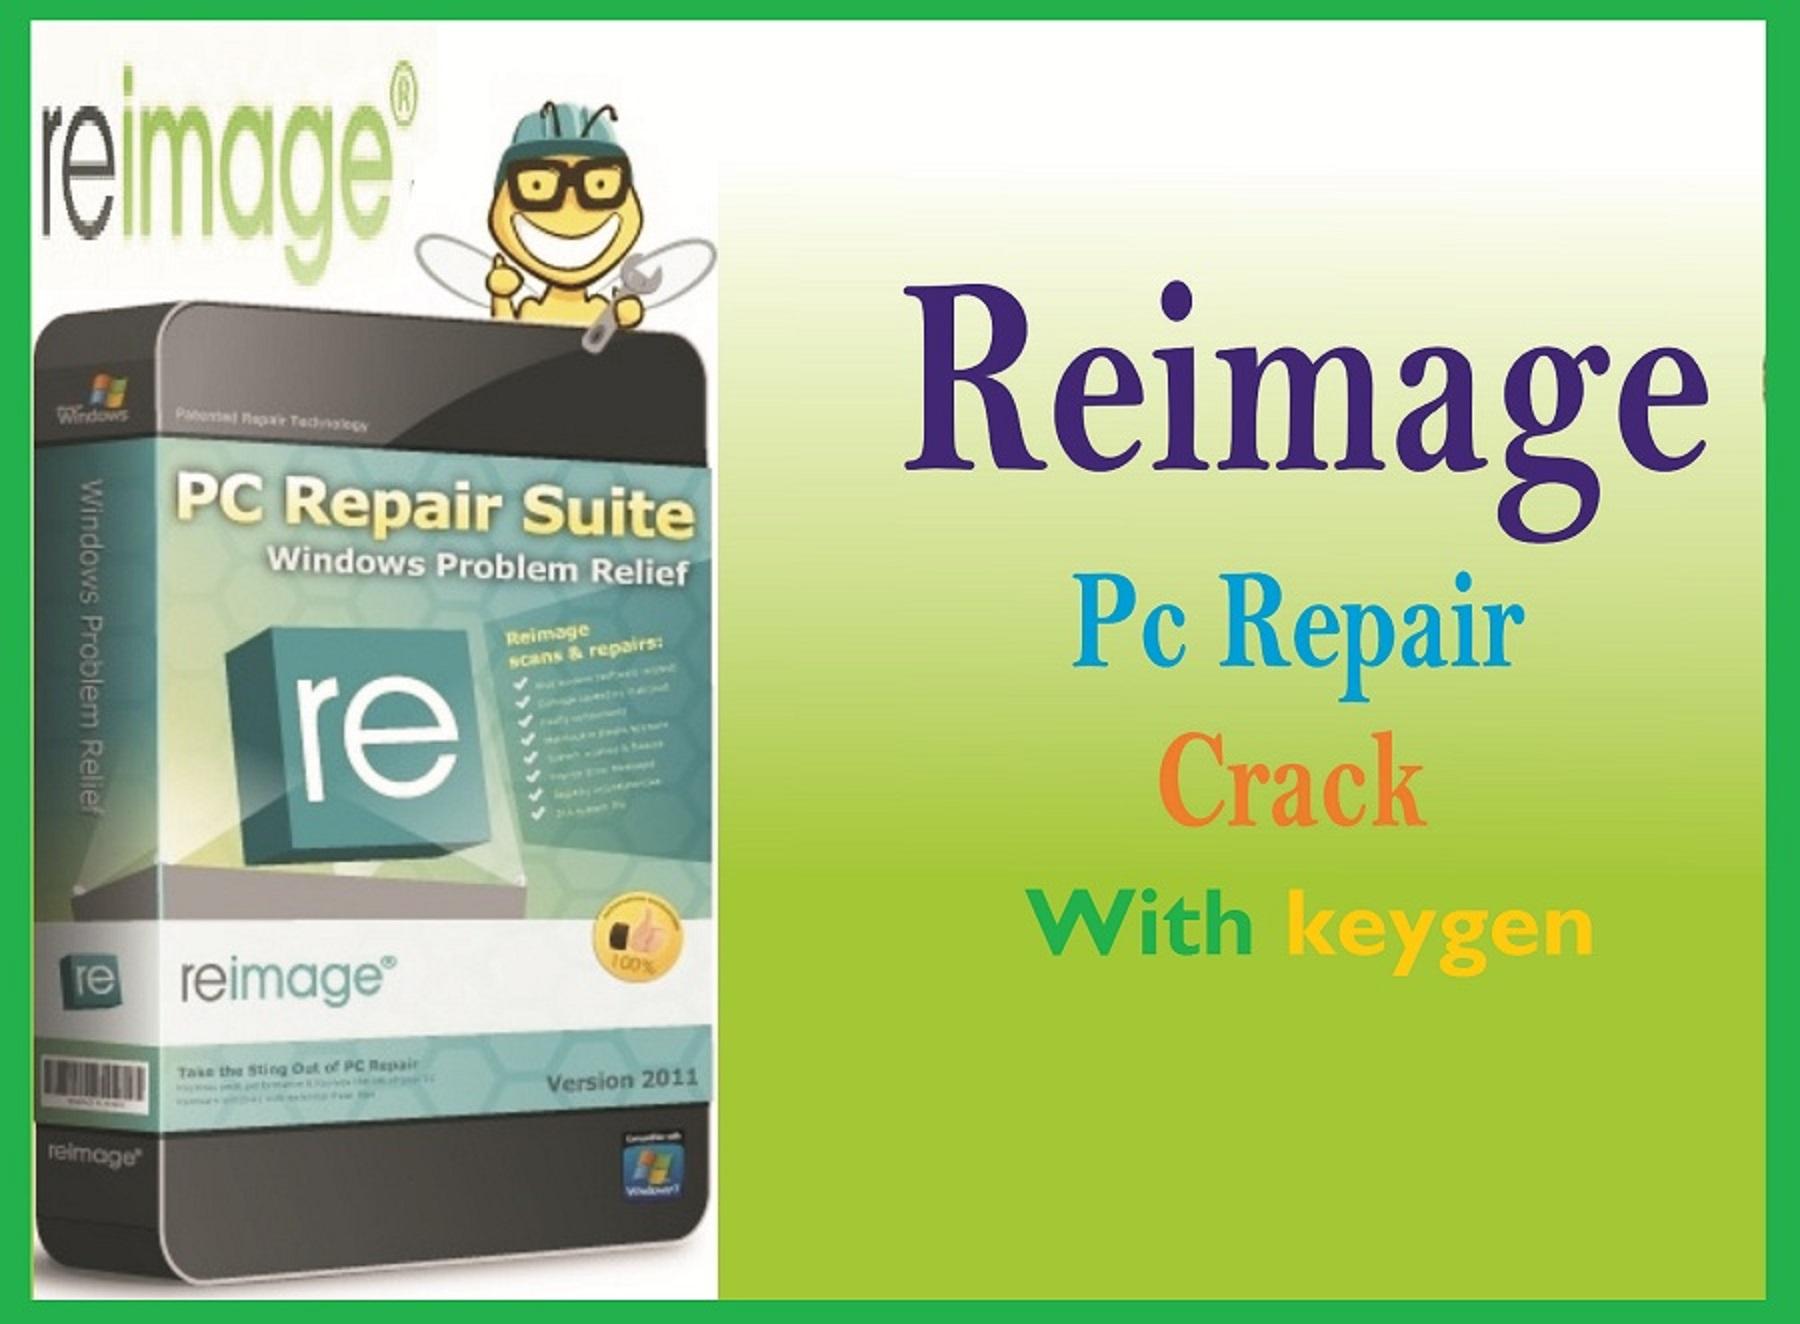 Reimage Pc Repair 2020 Crack With License Key Free Download